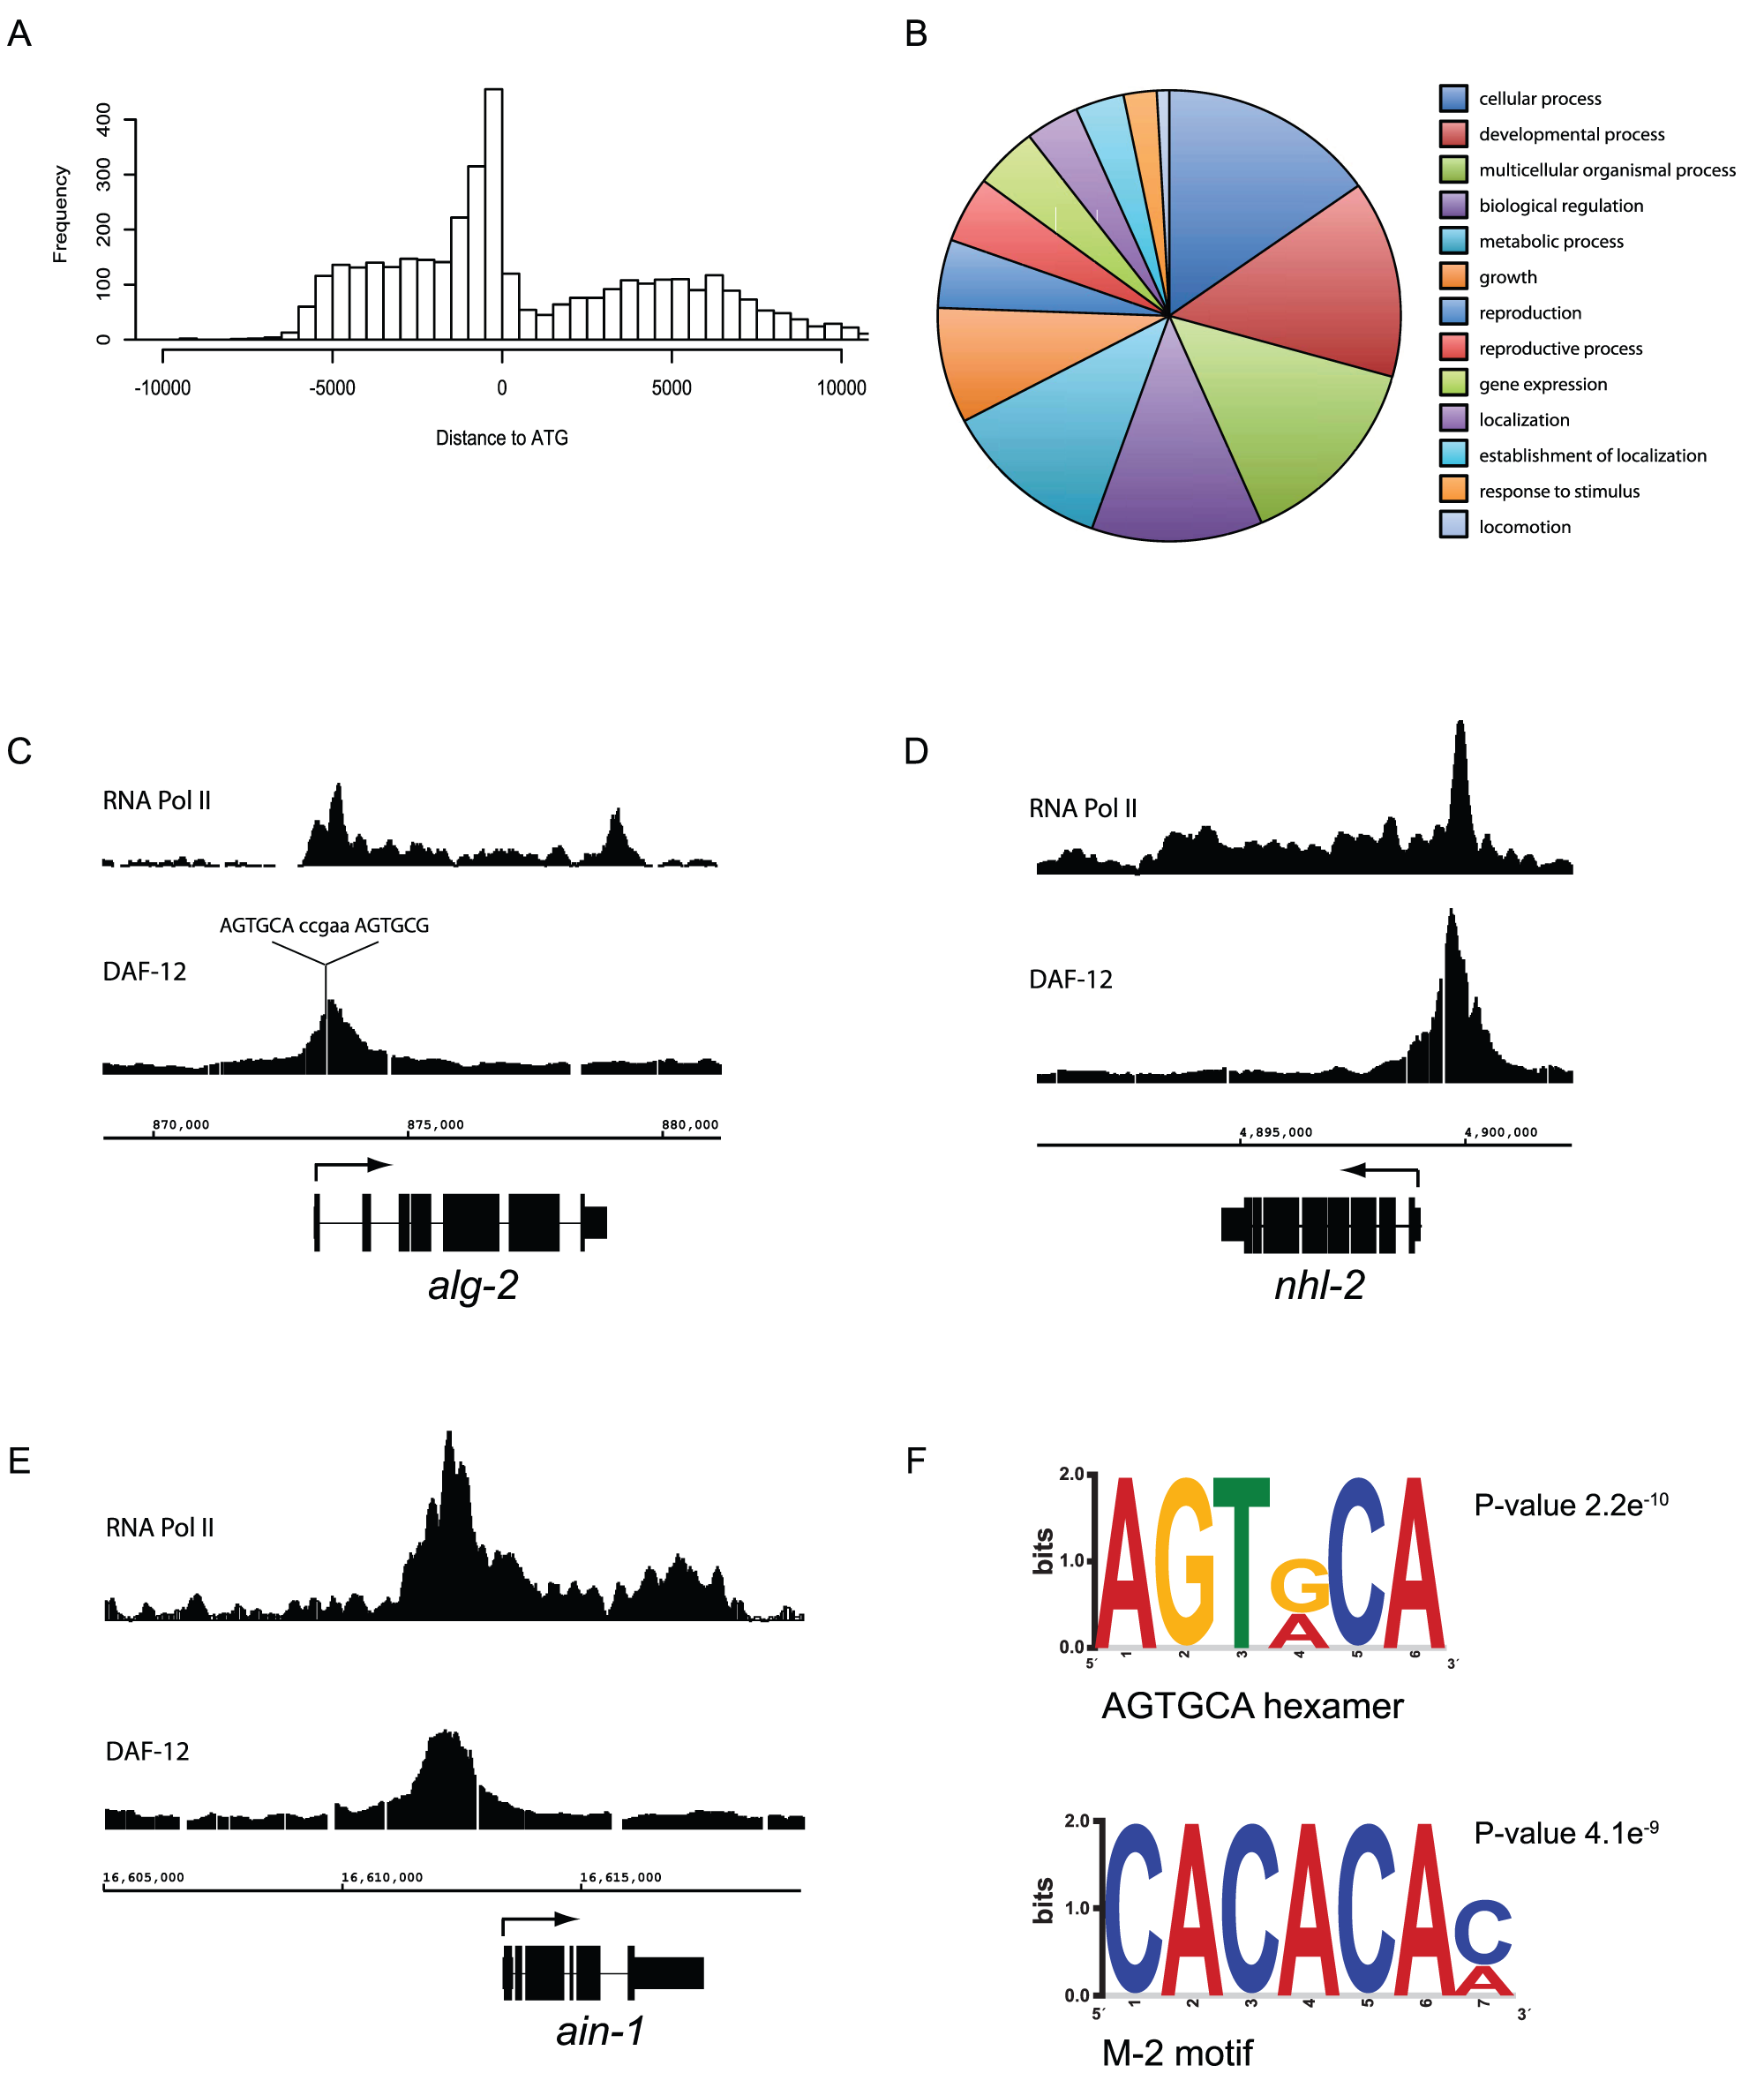 Analysis of DAF-12 binding sites.